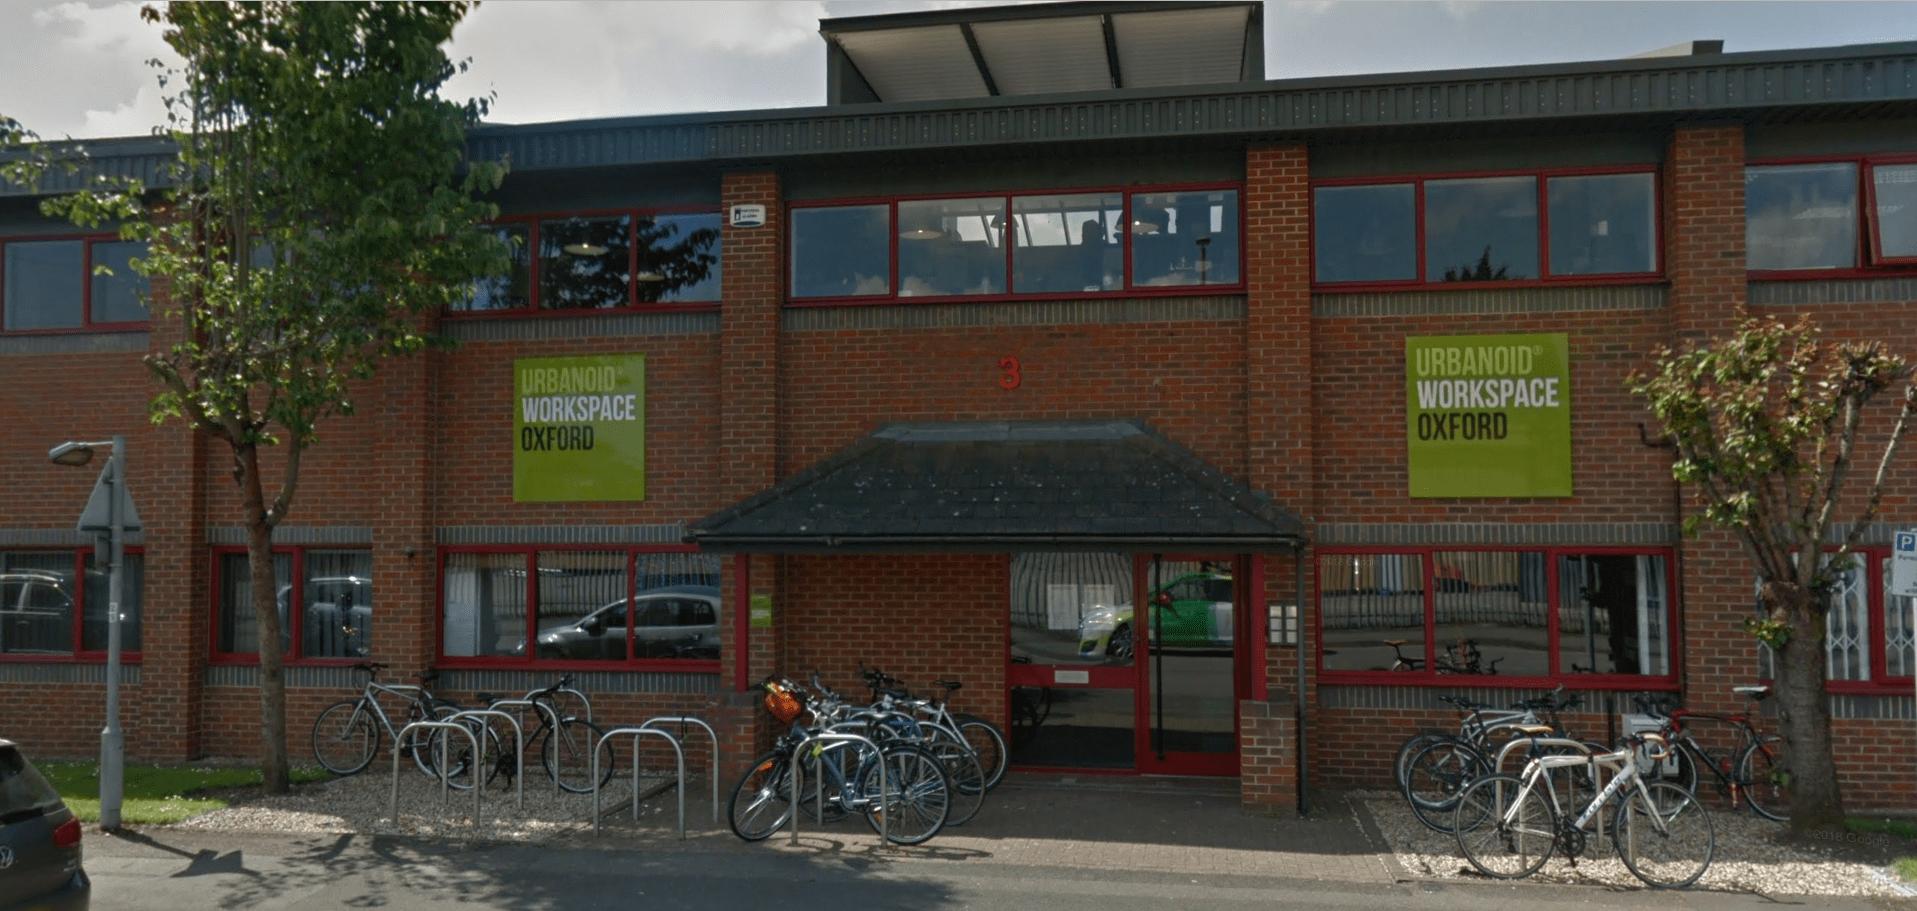 Urbanoid workspace in Oxford